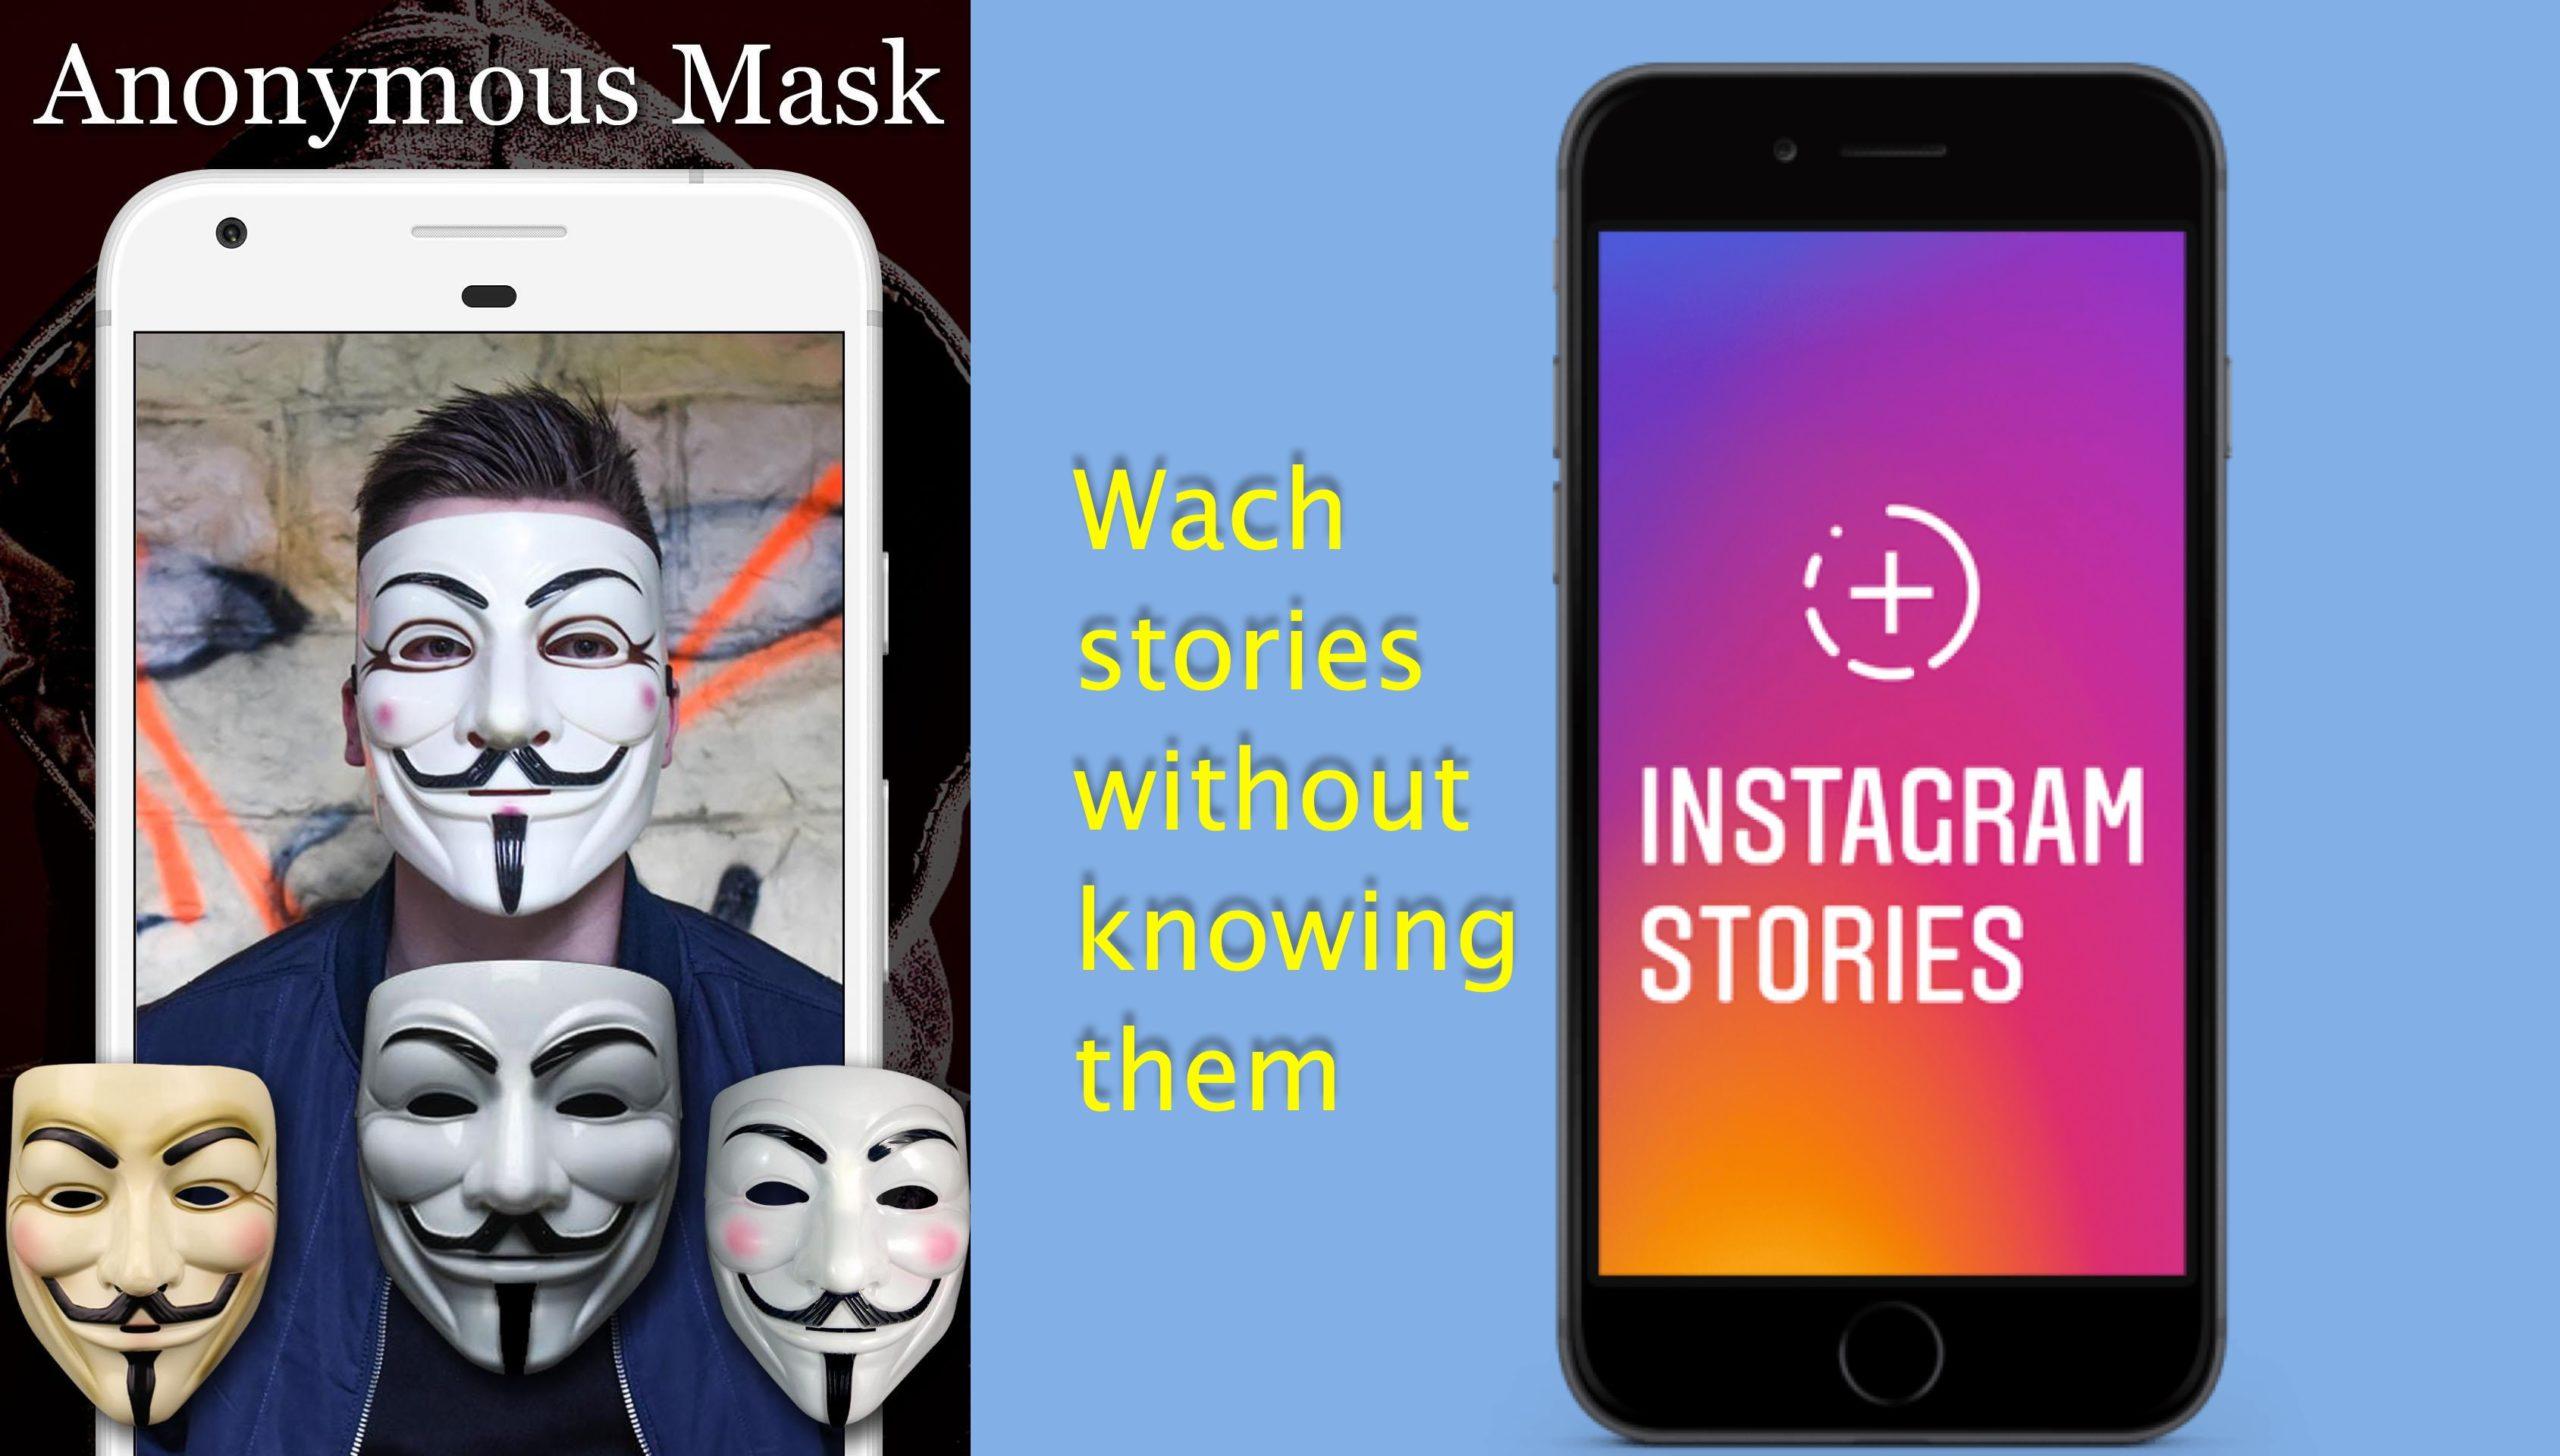 Instagram Stories secretly view